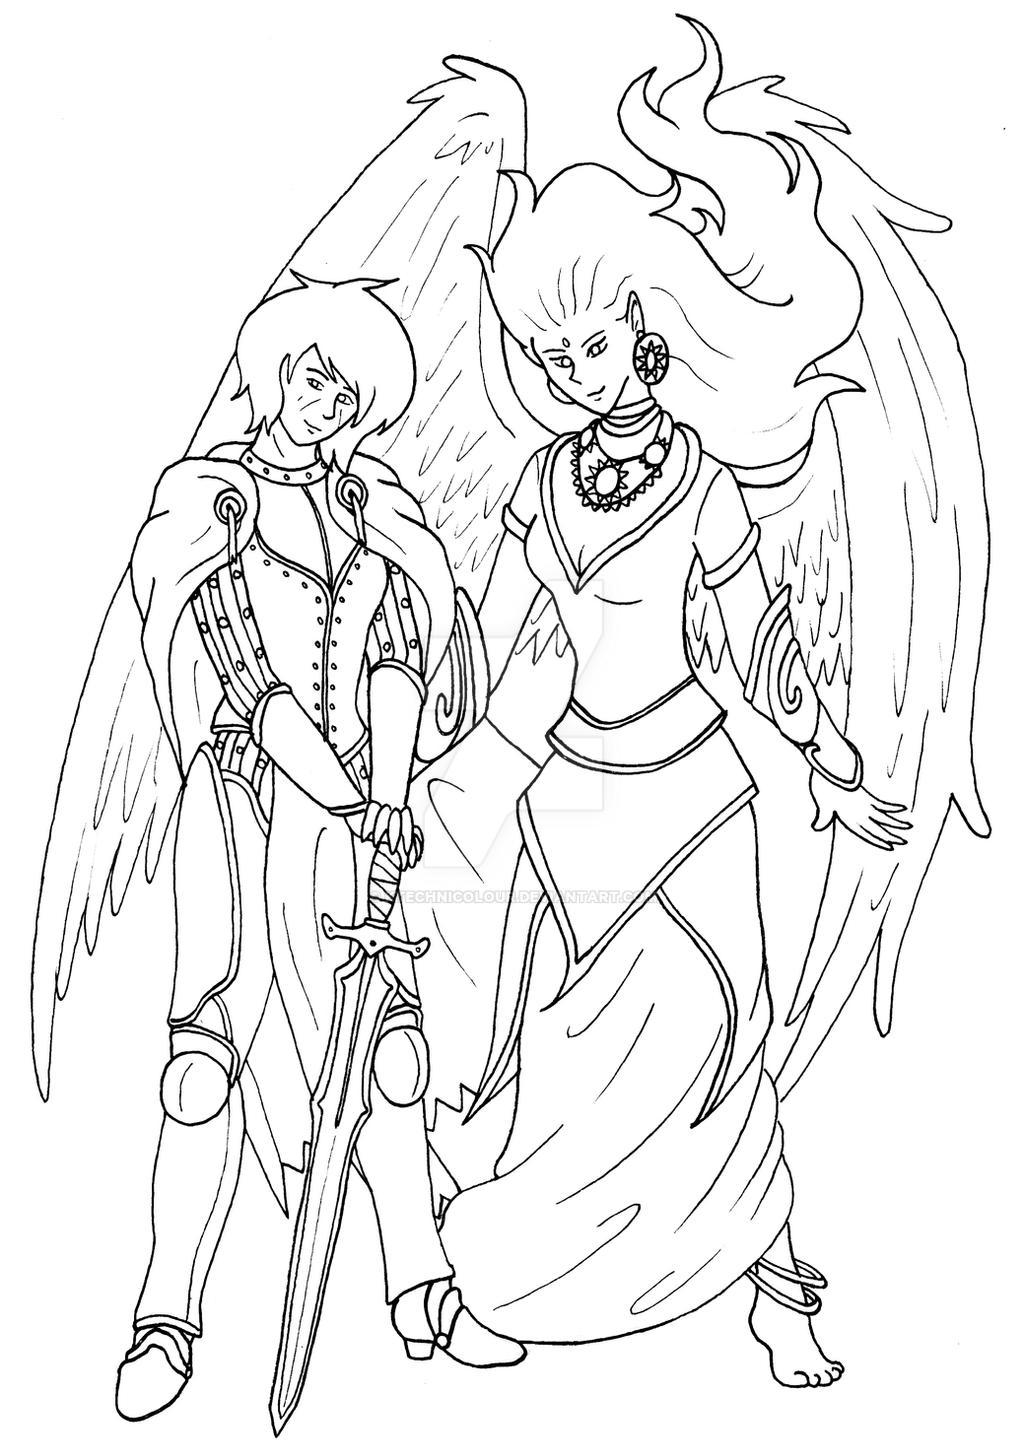 Iomedae and Sarenrae by KTechnicolour